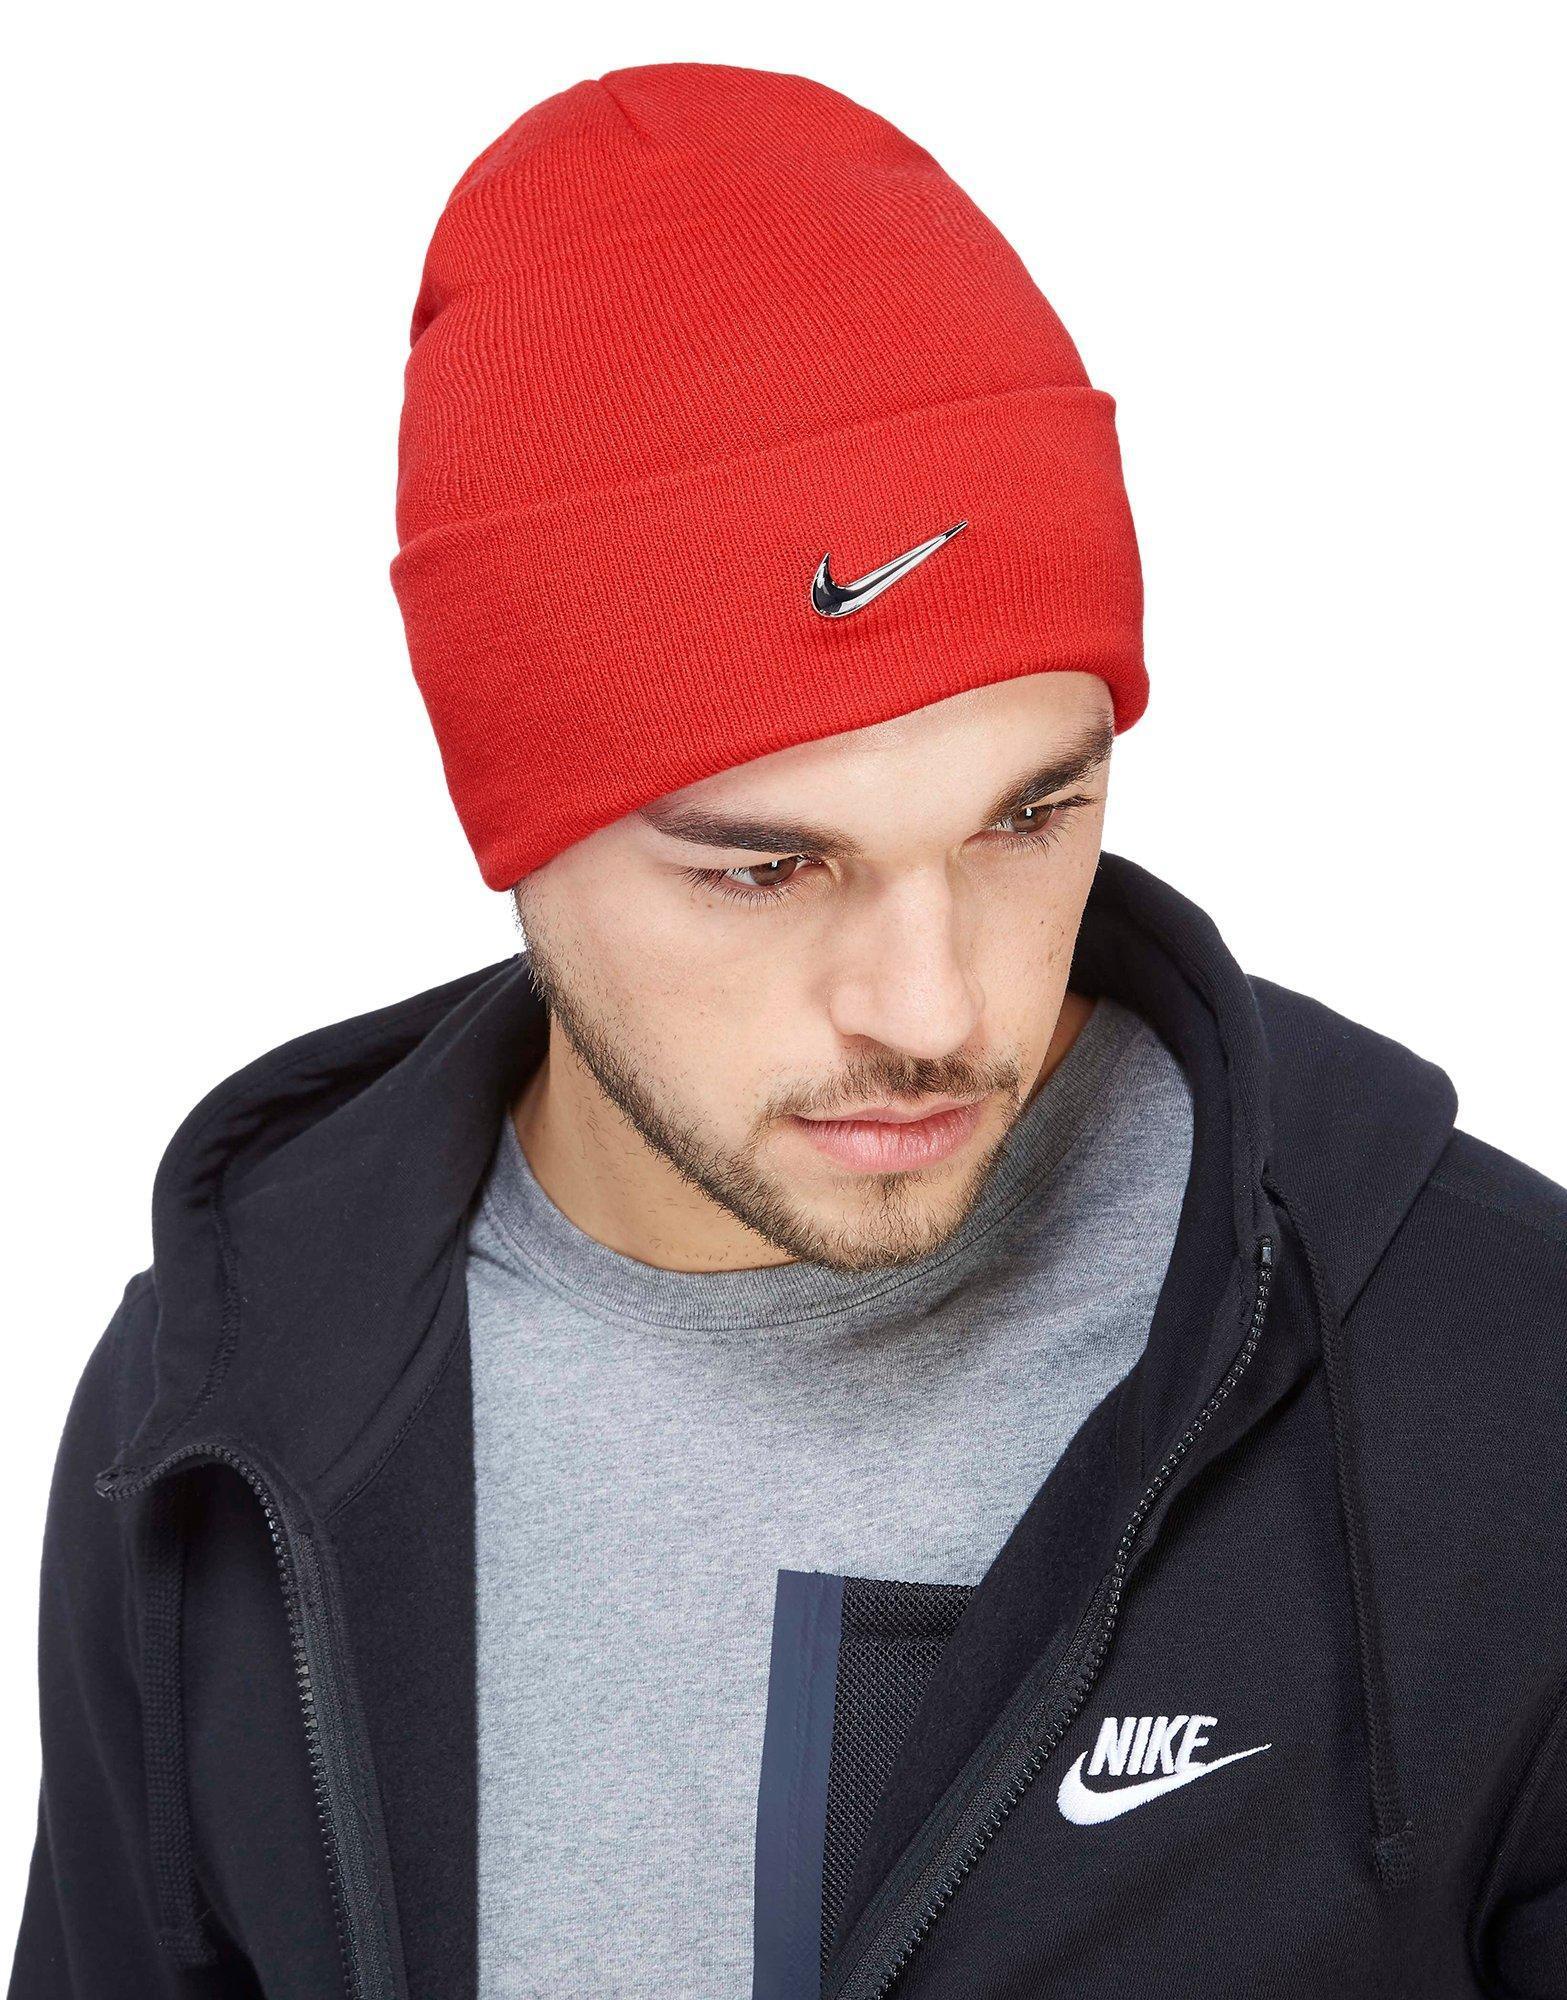 15076e17e0 Nike Swoosh Beanie Hat in Red for Men - Lyst